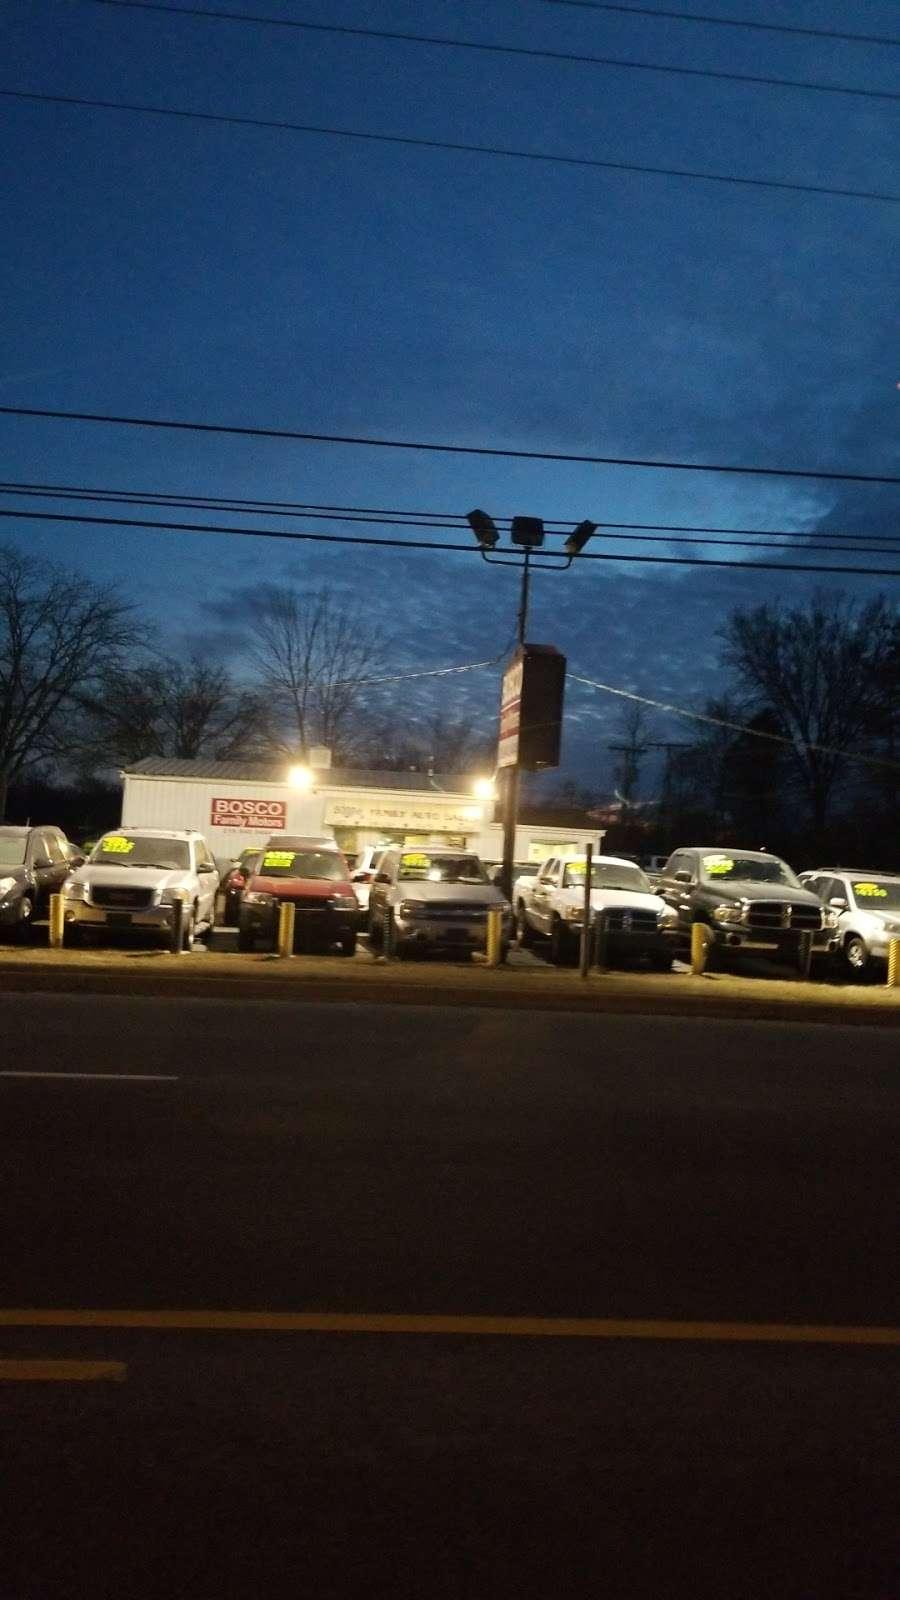 Bosco Family Motors - car dealer  | Photo 3 of 3 | Address: 933 W 37th Ave, Hobart, IN 46342, USA | Phone: (219) 940-9404